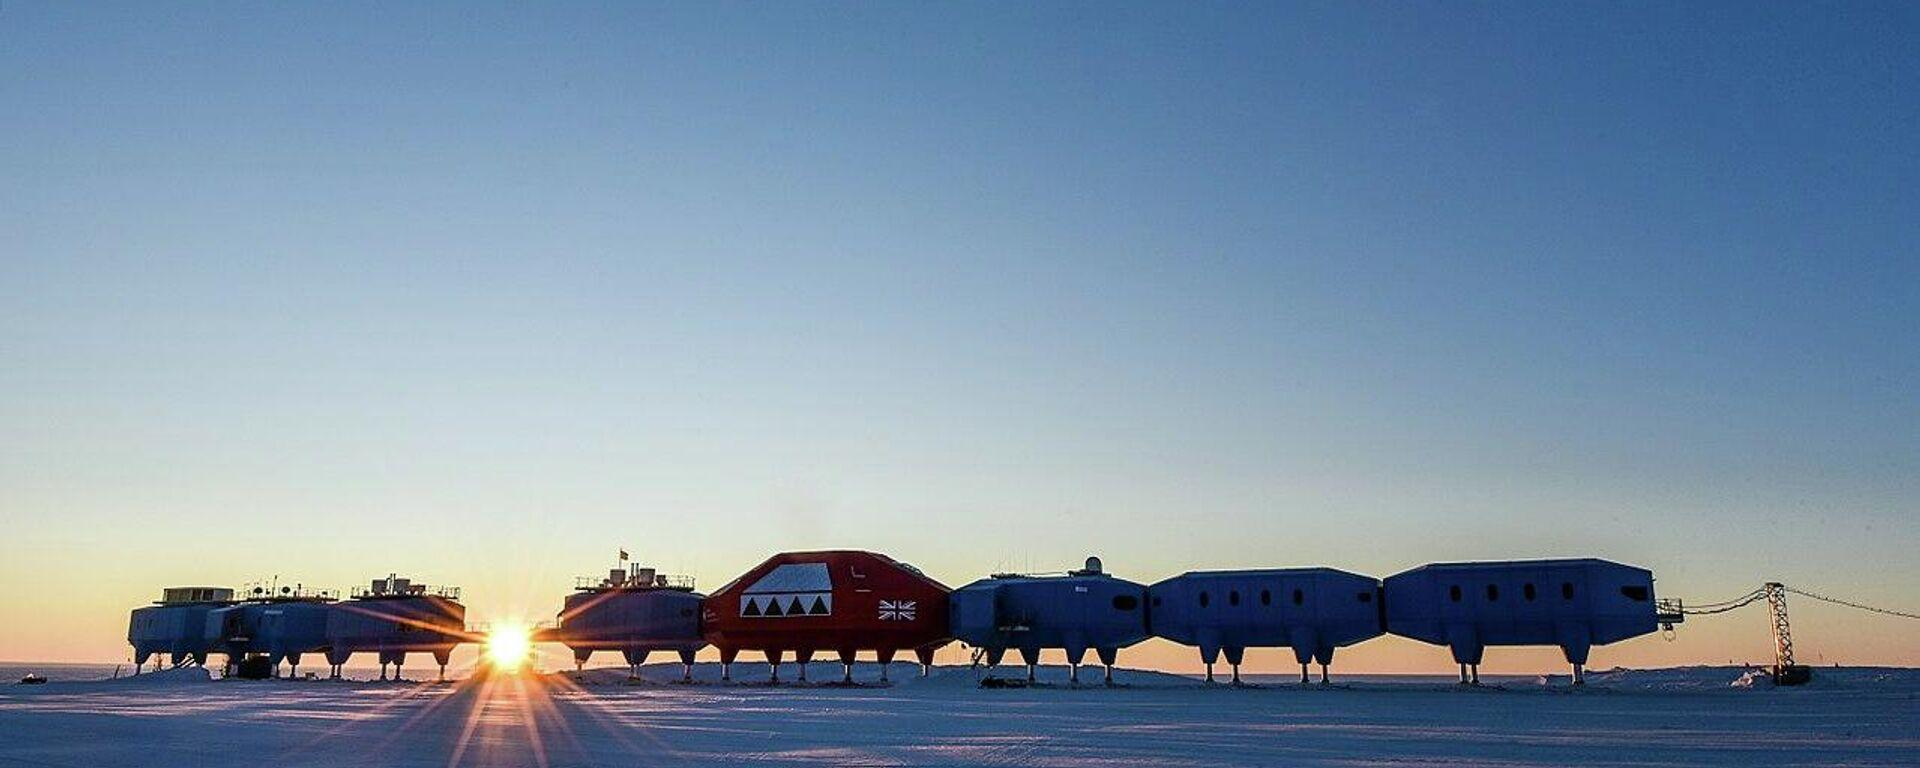 "Polarstation ""Halley VI"" in der Antarktis (Archivbild) - SNA, 1920, 17.12.2020"